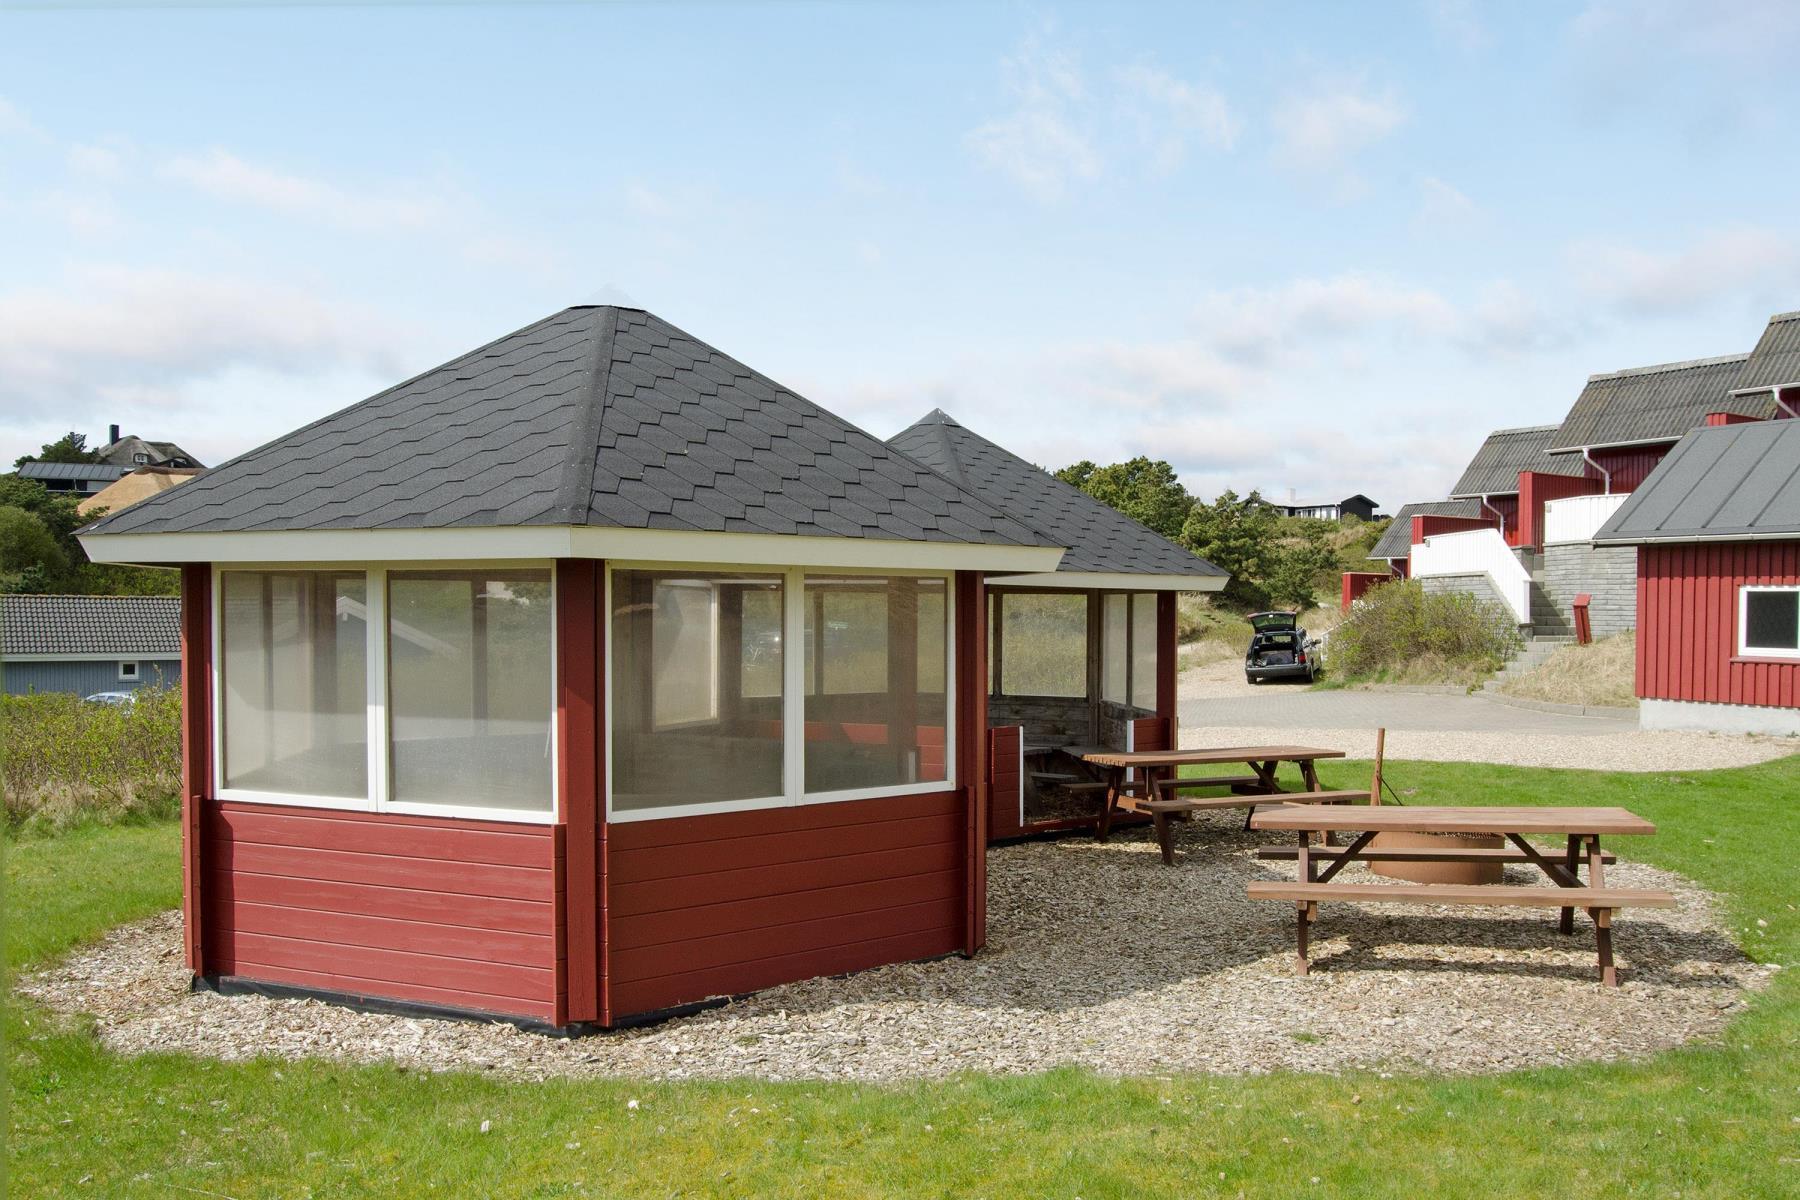 Ferienhaus 1025 - Hjelmevej 15, App. 25